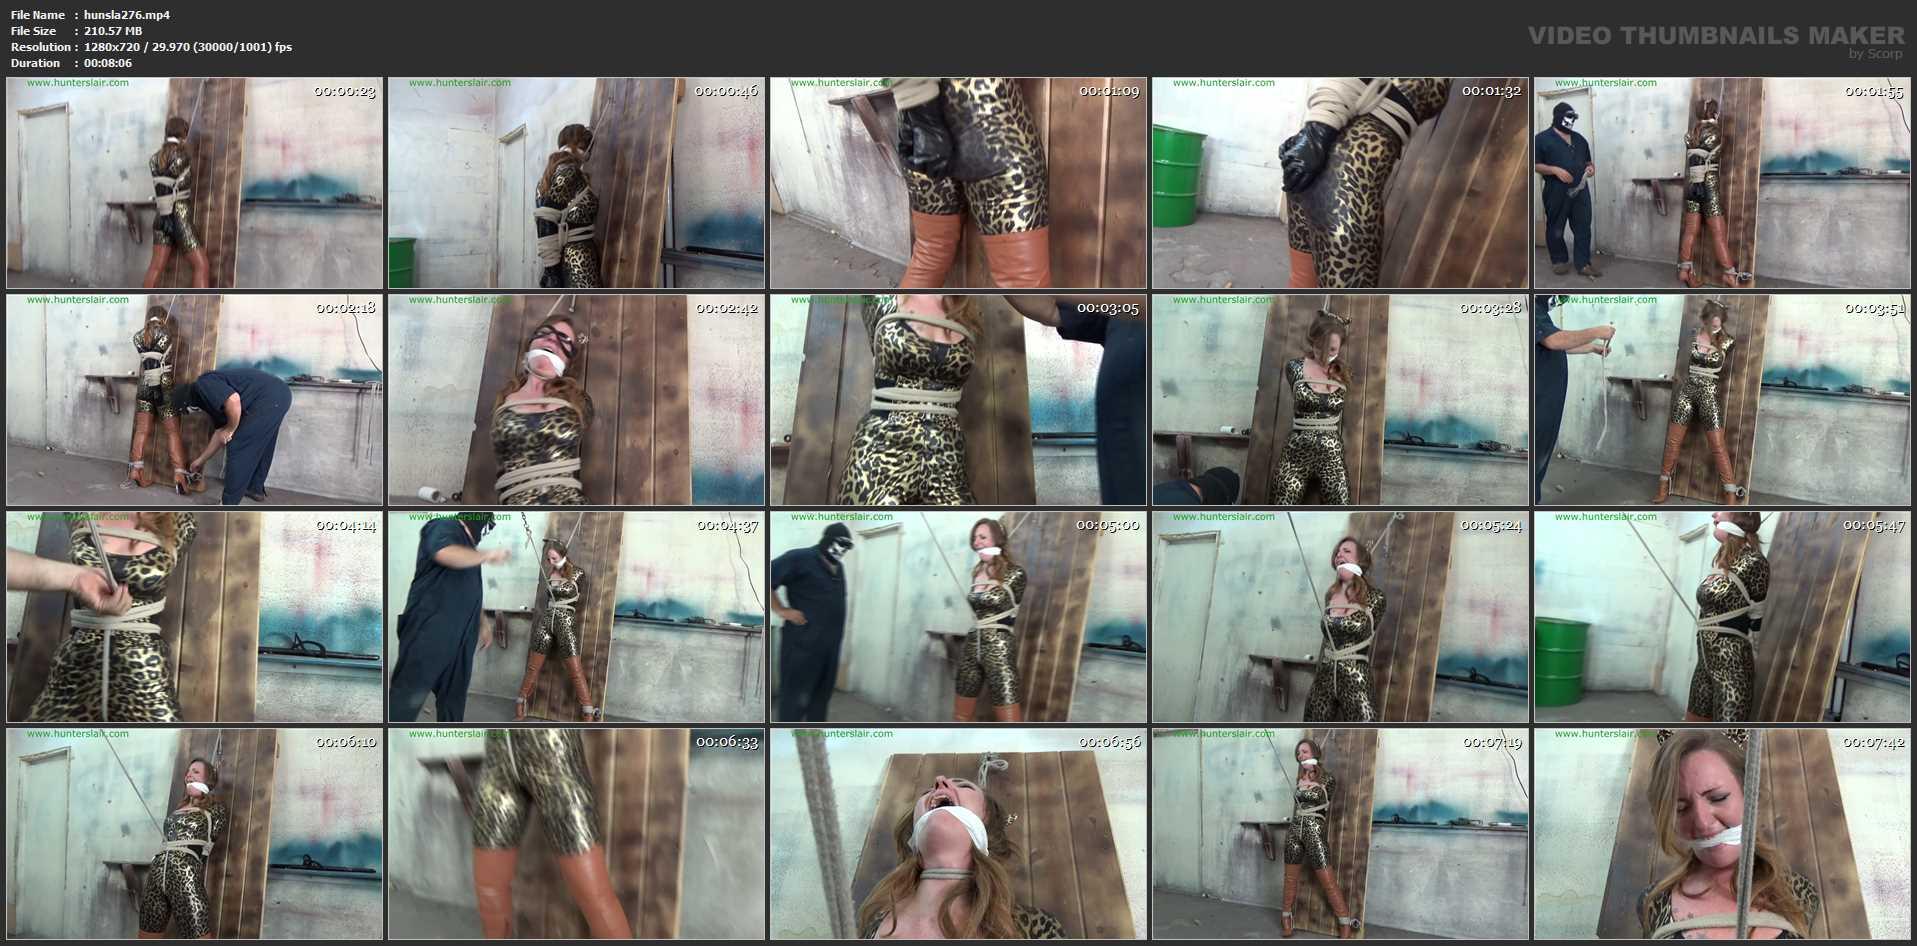 [HUNTERSLAIR] Crotch roped interrogation. Featuring: Launa Lane [HD][720p][MP4]